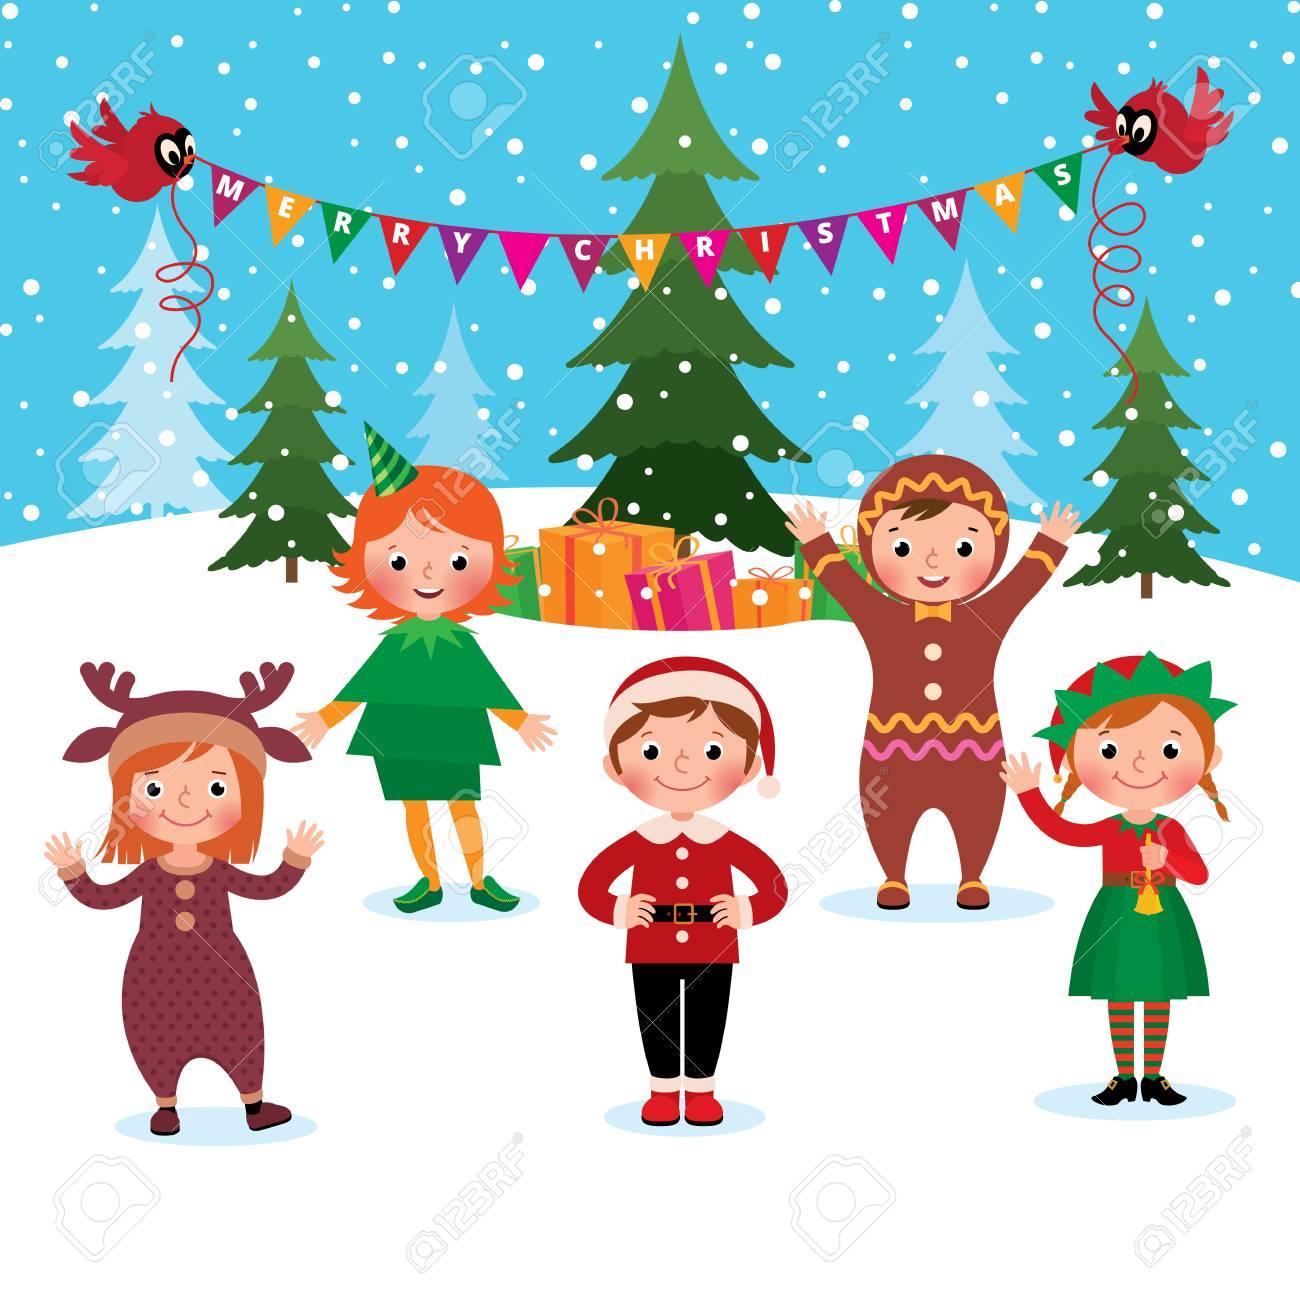 Christmas Celebration Cartoon Images.Cartoon Vector Illustration Of A Group Of Children Celebrate